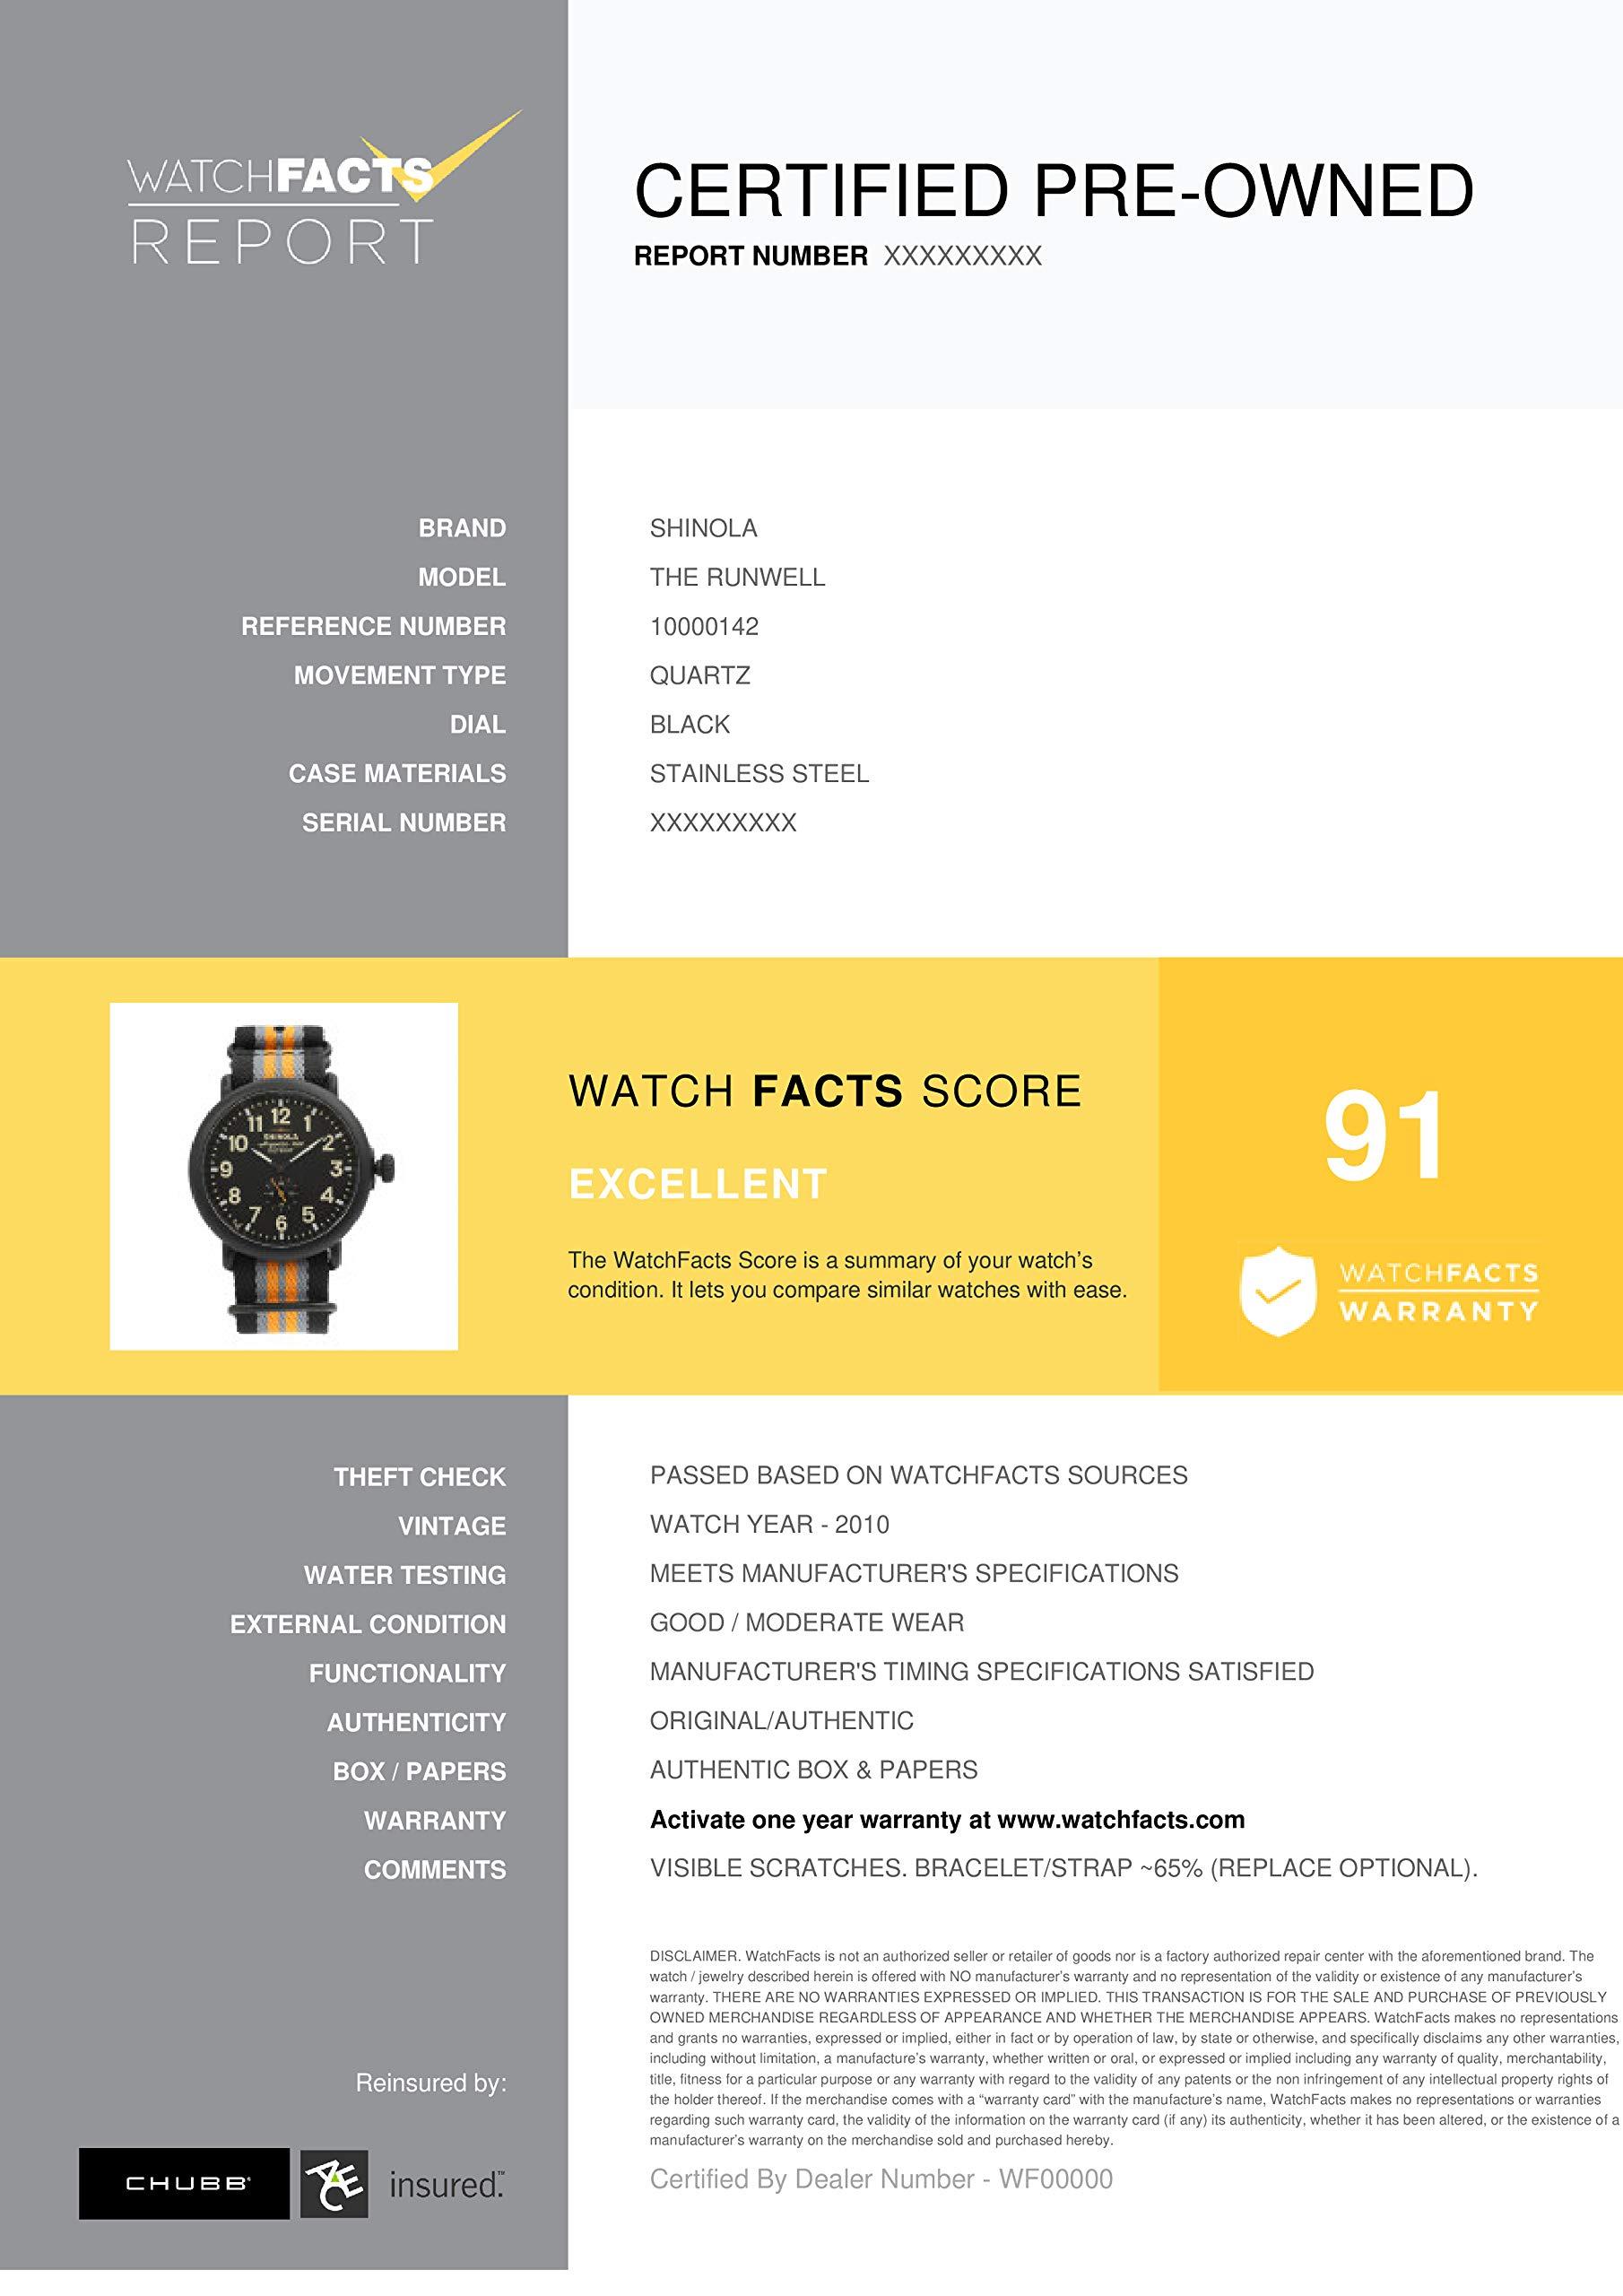 Shinola The Runwell Quartz Male Watch 10000142 (Certified Pre-Owned) by Shinola (Image #5)